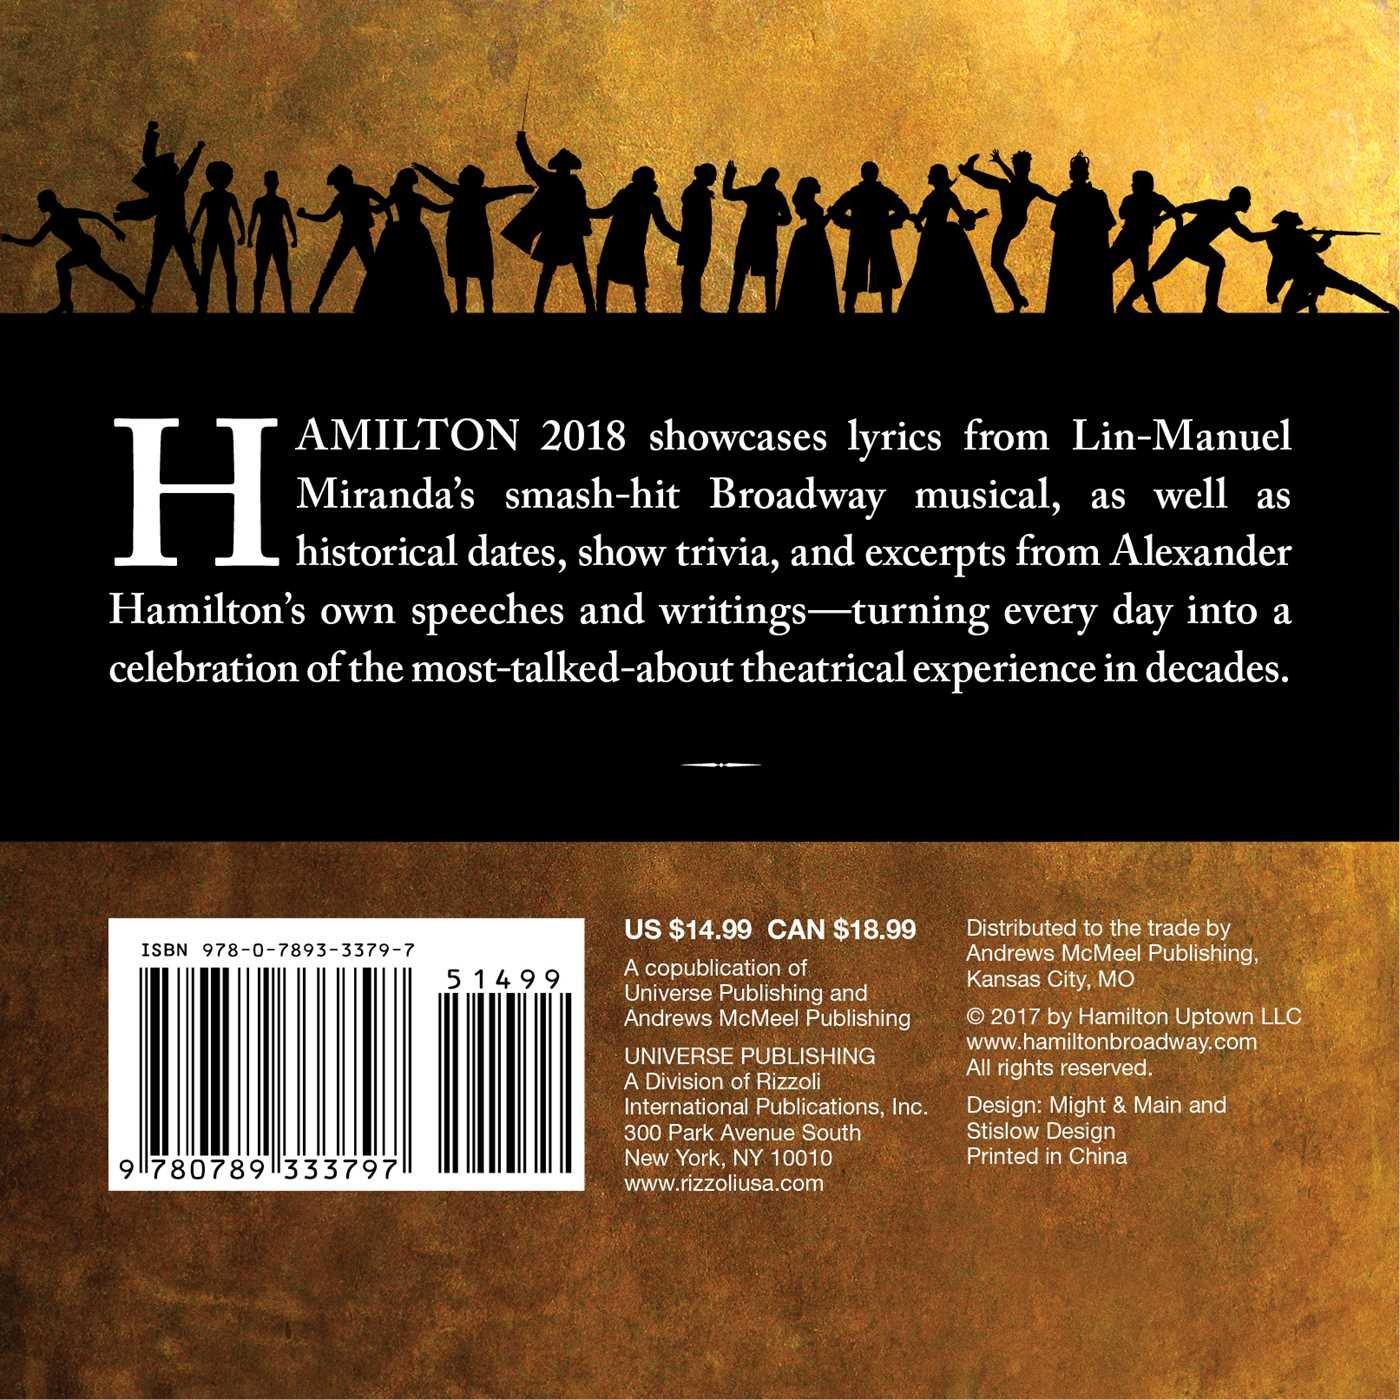 Hamilton 2018 Day to Day Calendar: Hamilton Uptown LLC